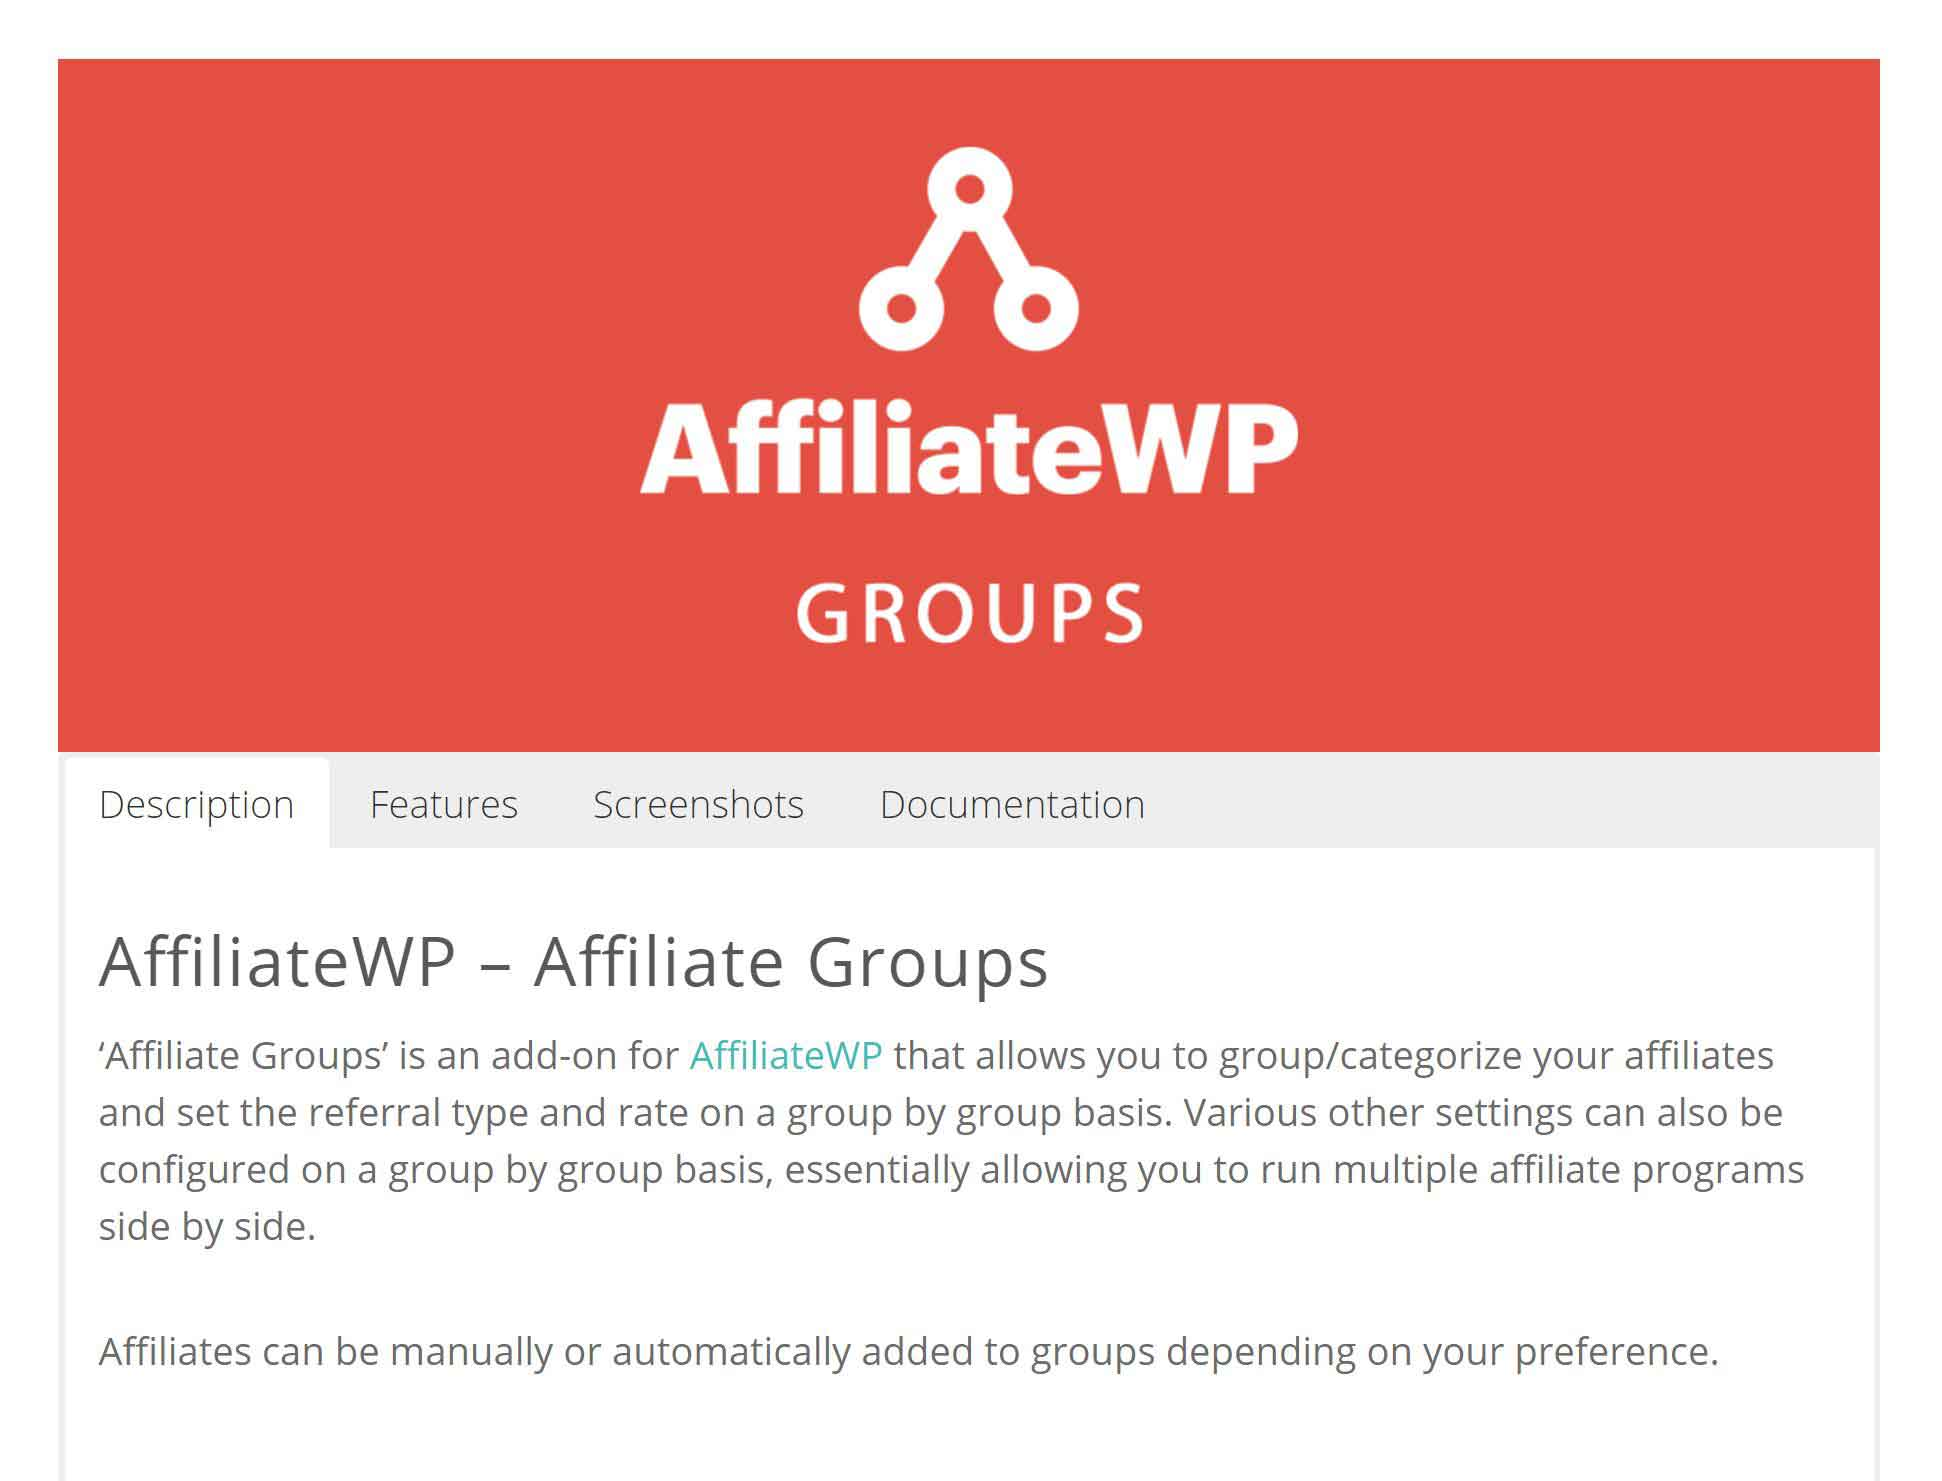 AffiliateWP – Affiliate Groups